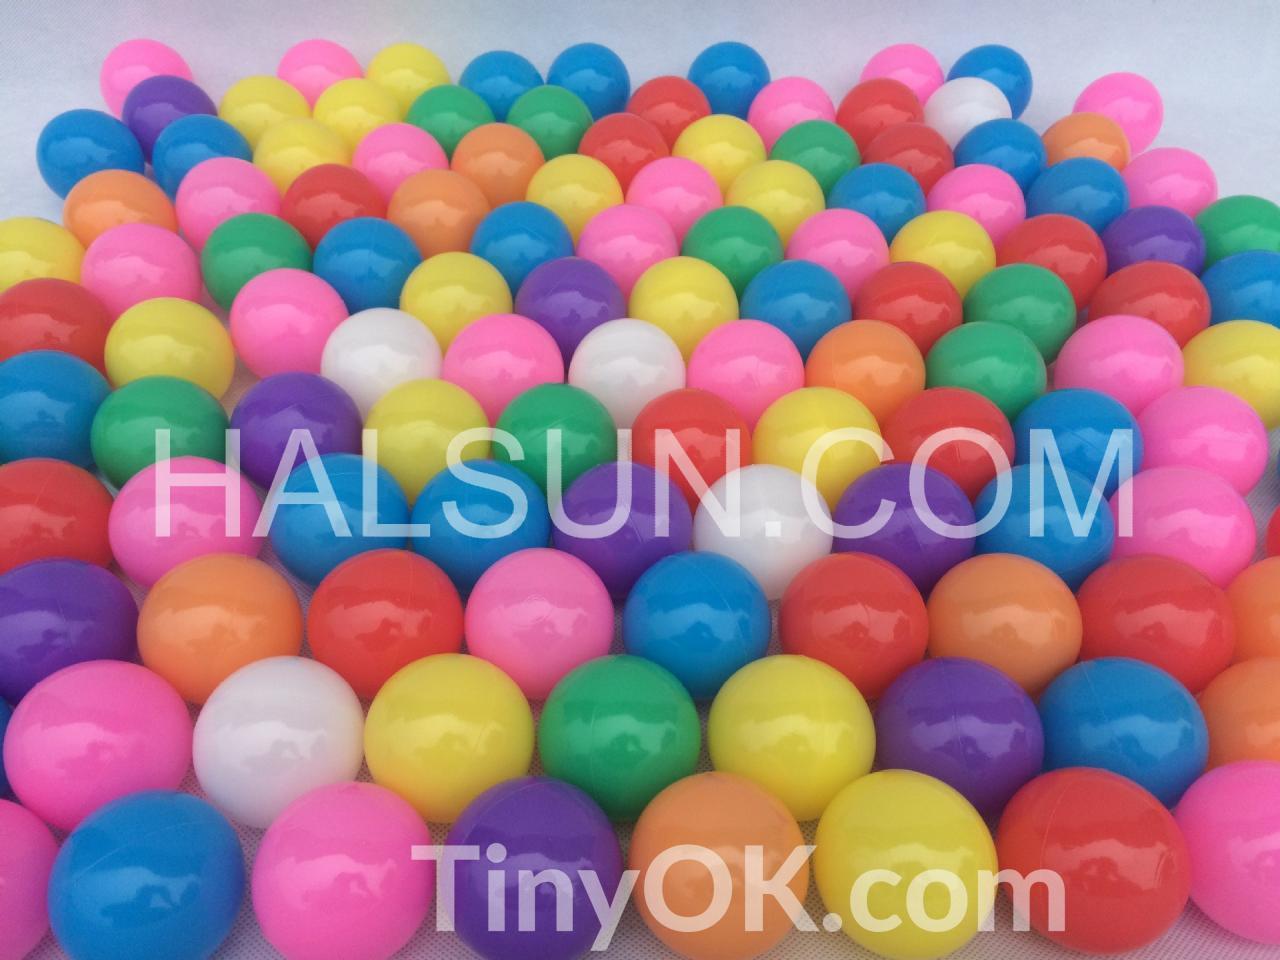 plastic-ocean-balls-7.jpg